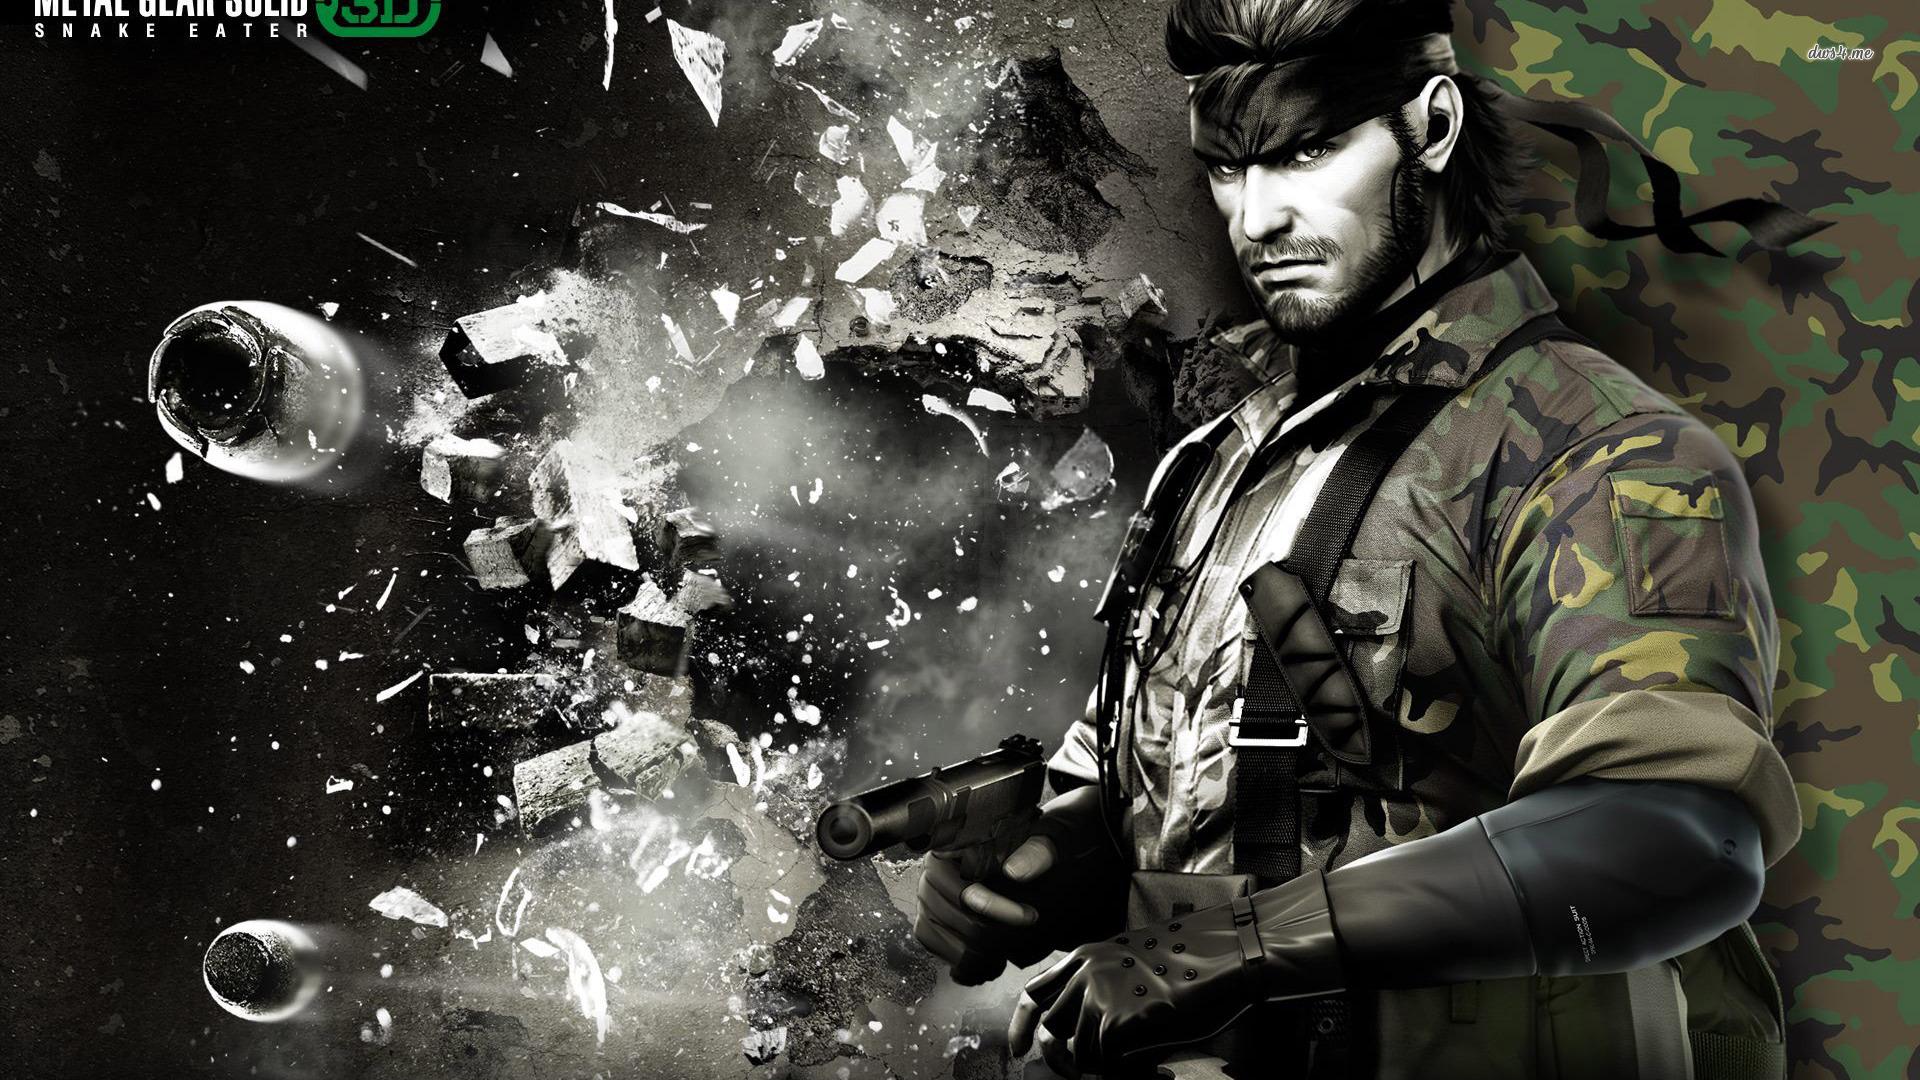 Free Download Games Metal Gear Solid Metal Gear Solid 3 Snake